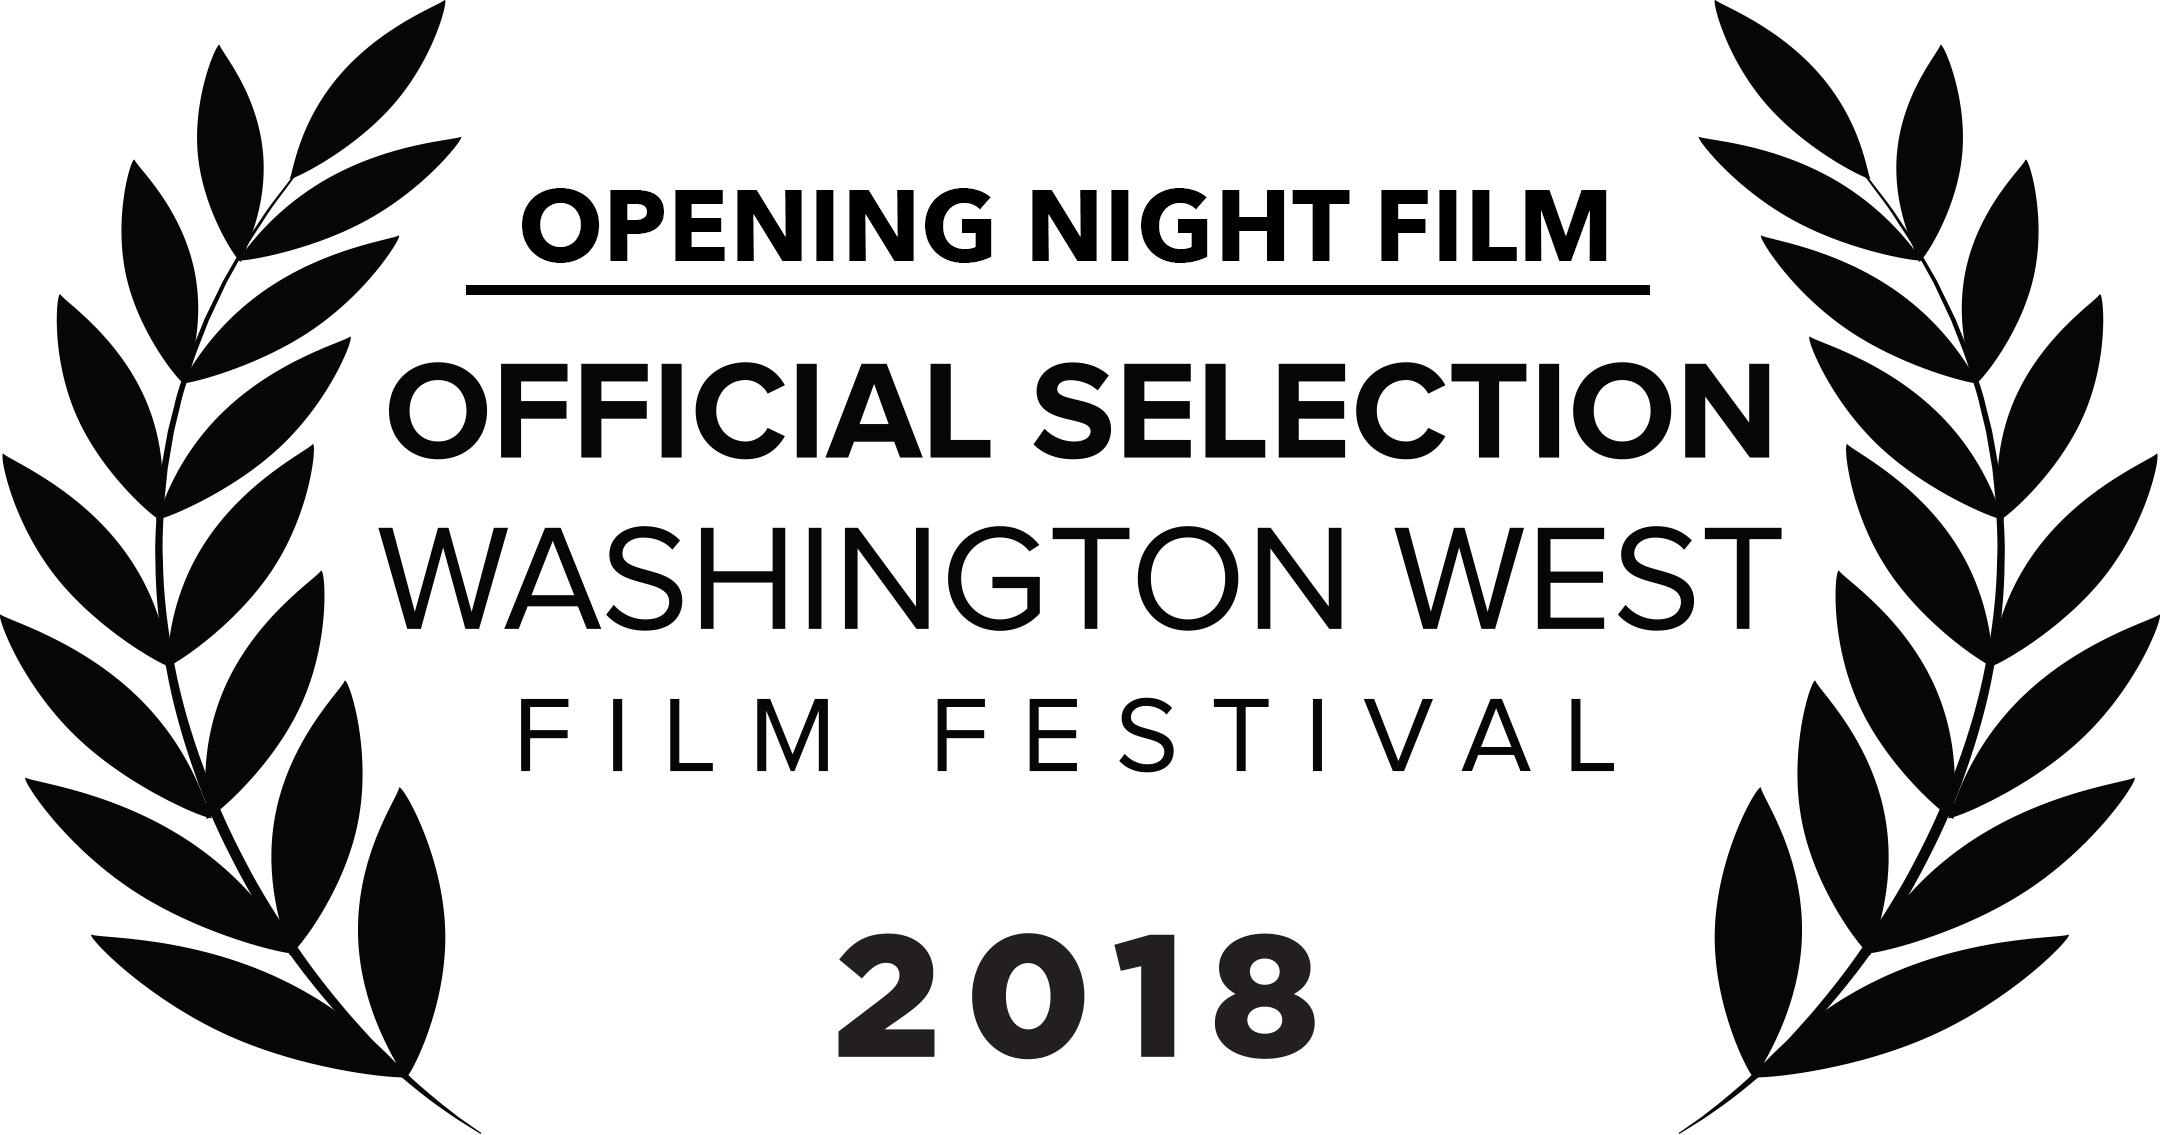 2018-WWFFblack-opening night film.jpg